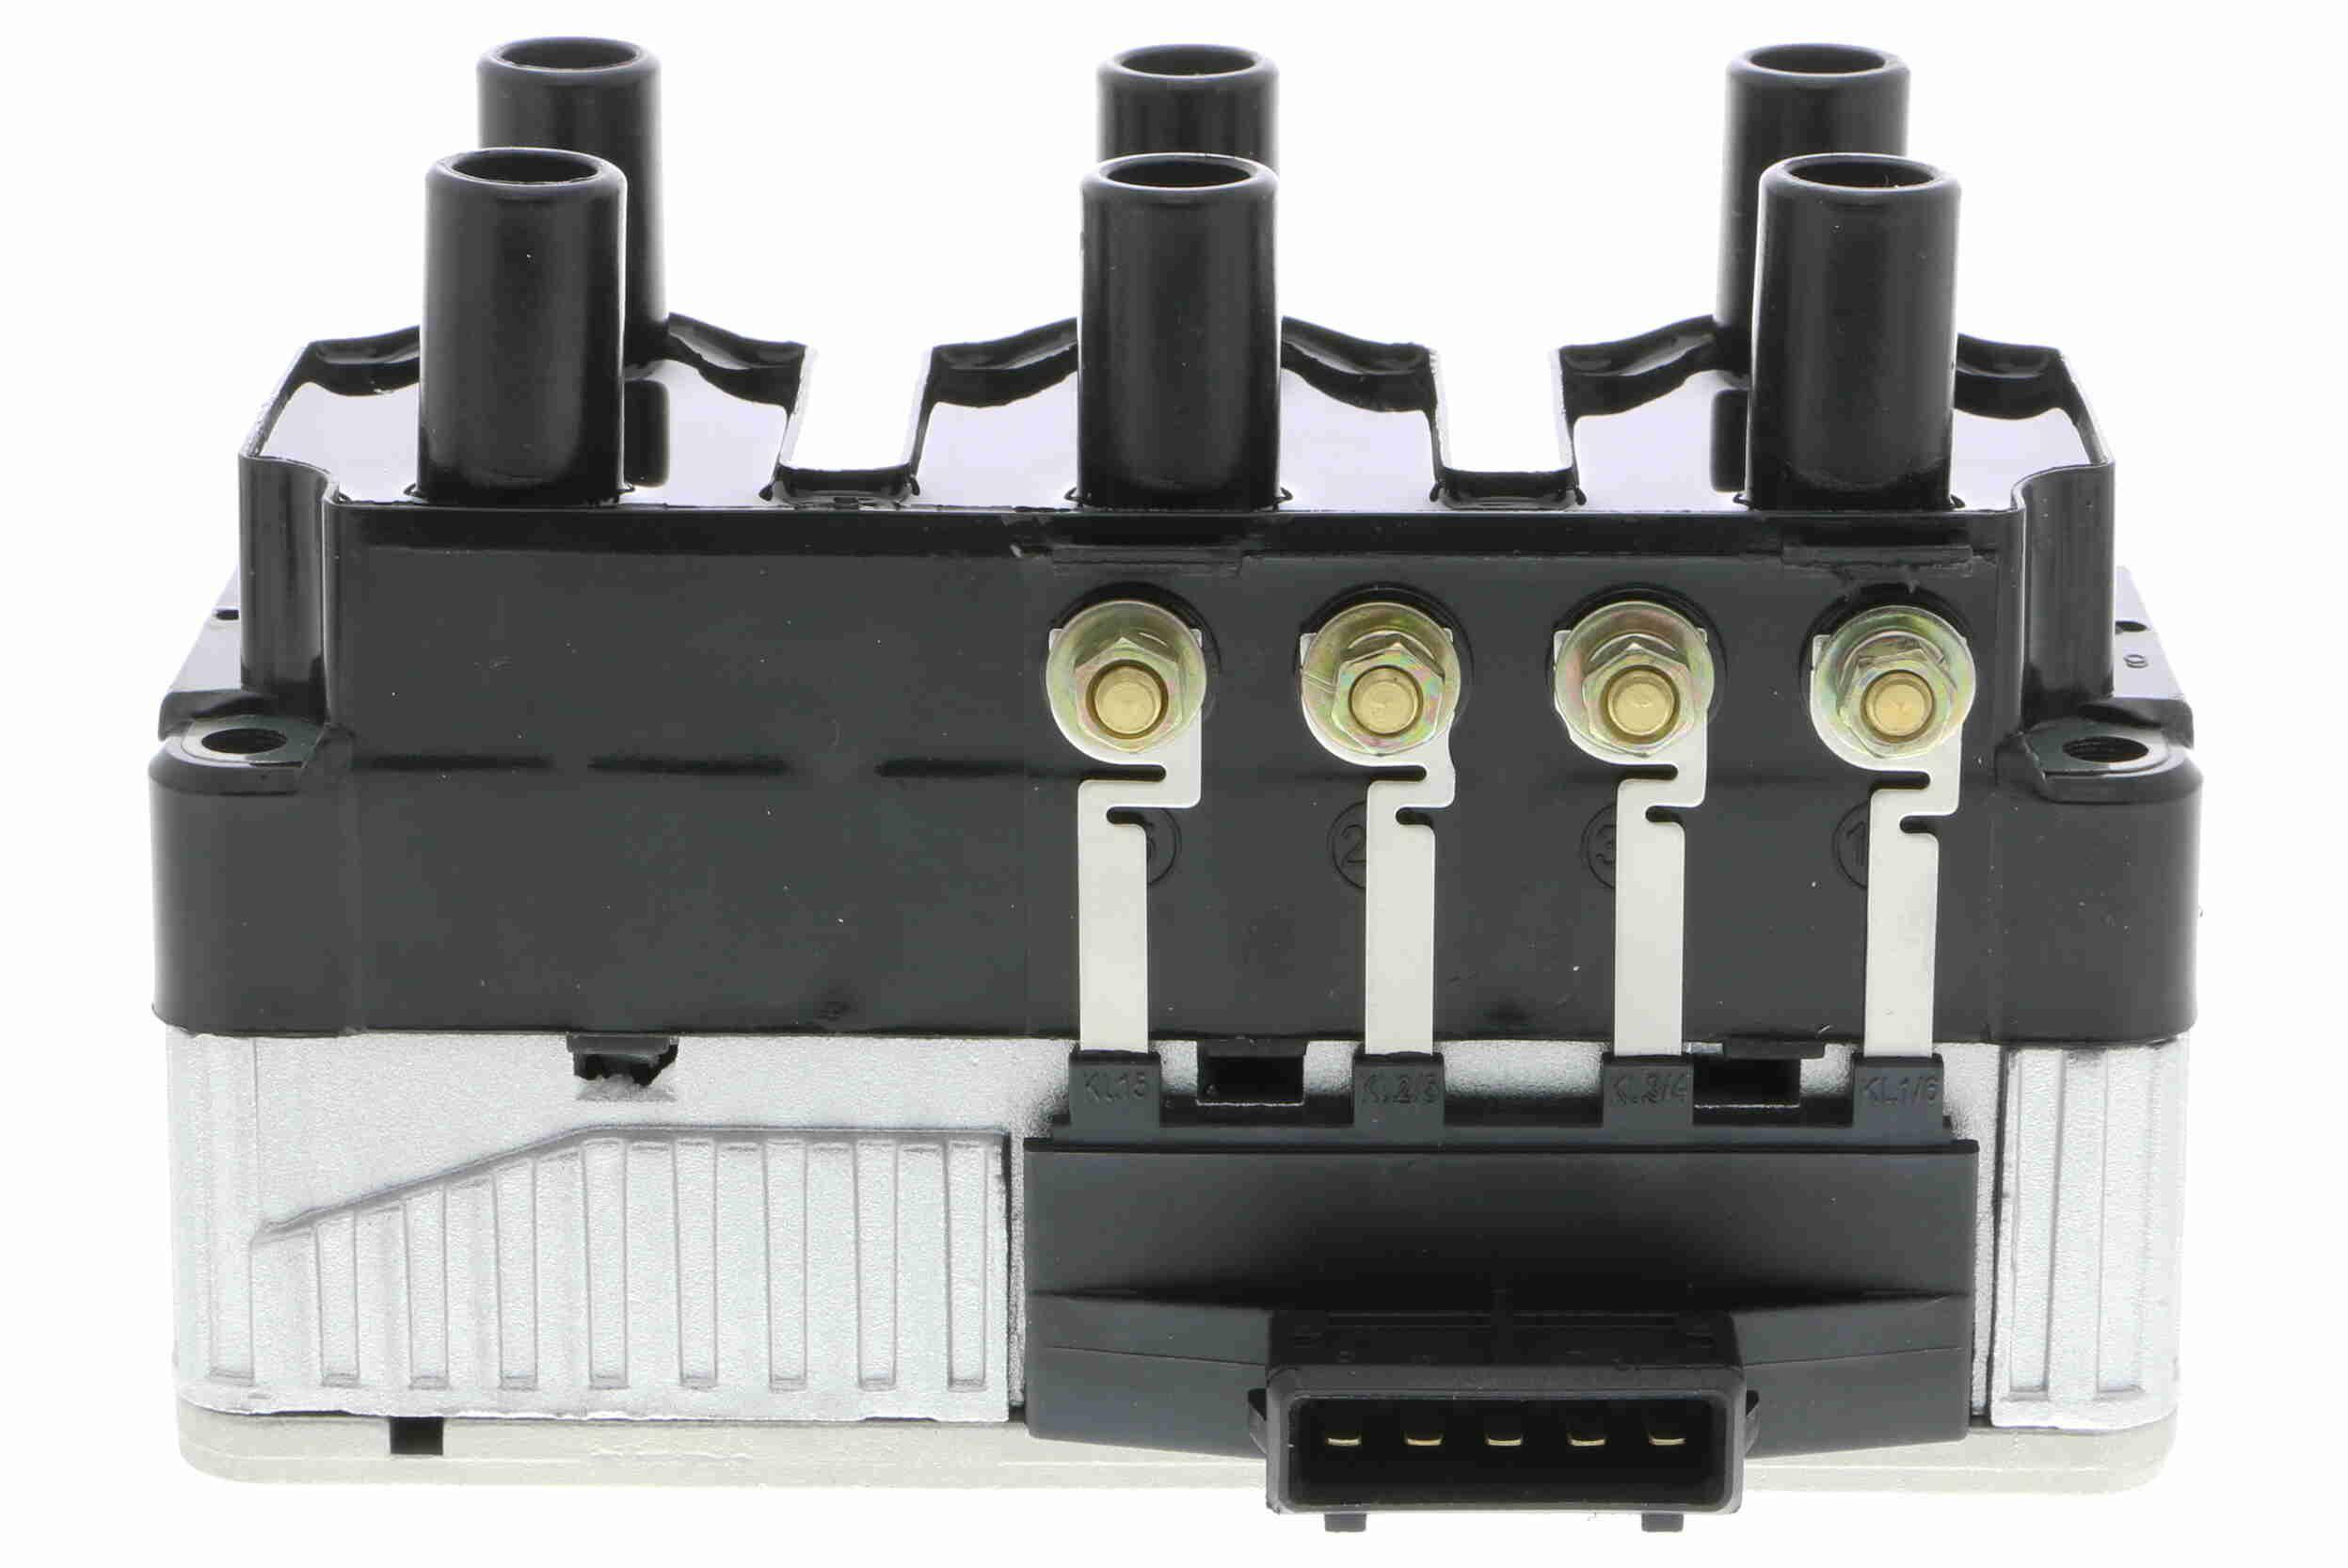 Zündspule V10-70-0069 VEMO V10-70-0069 in Original Qualität